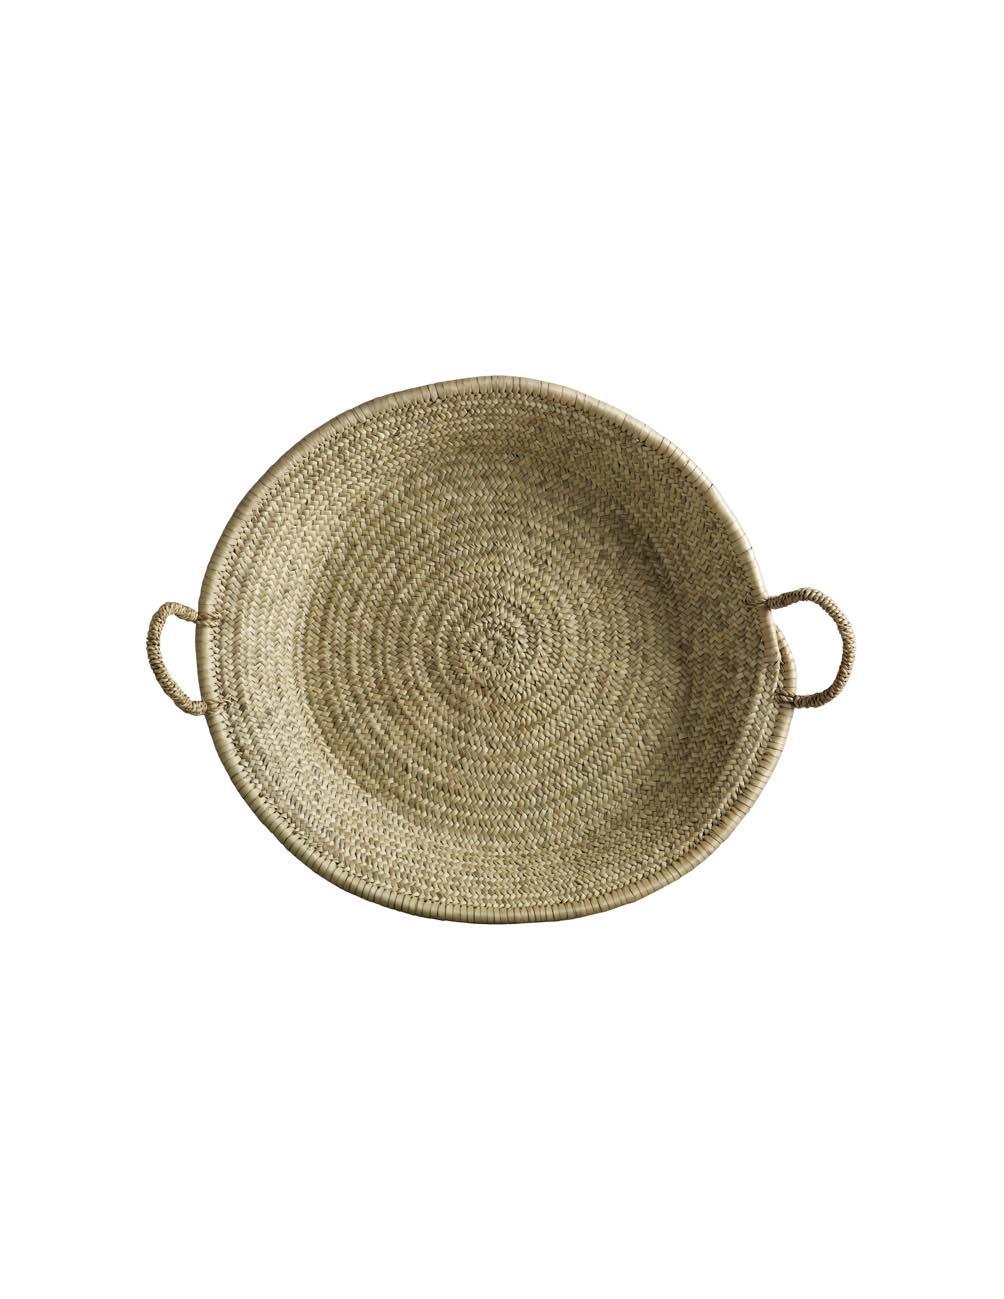 Large Table basket